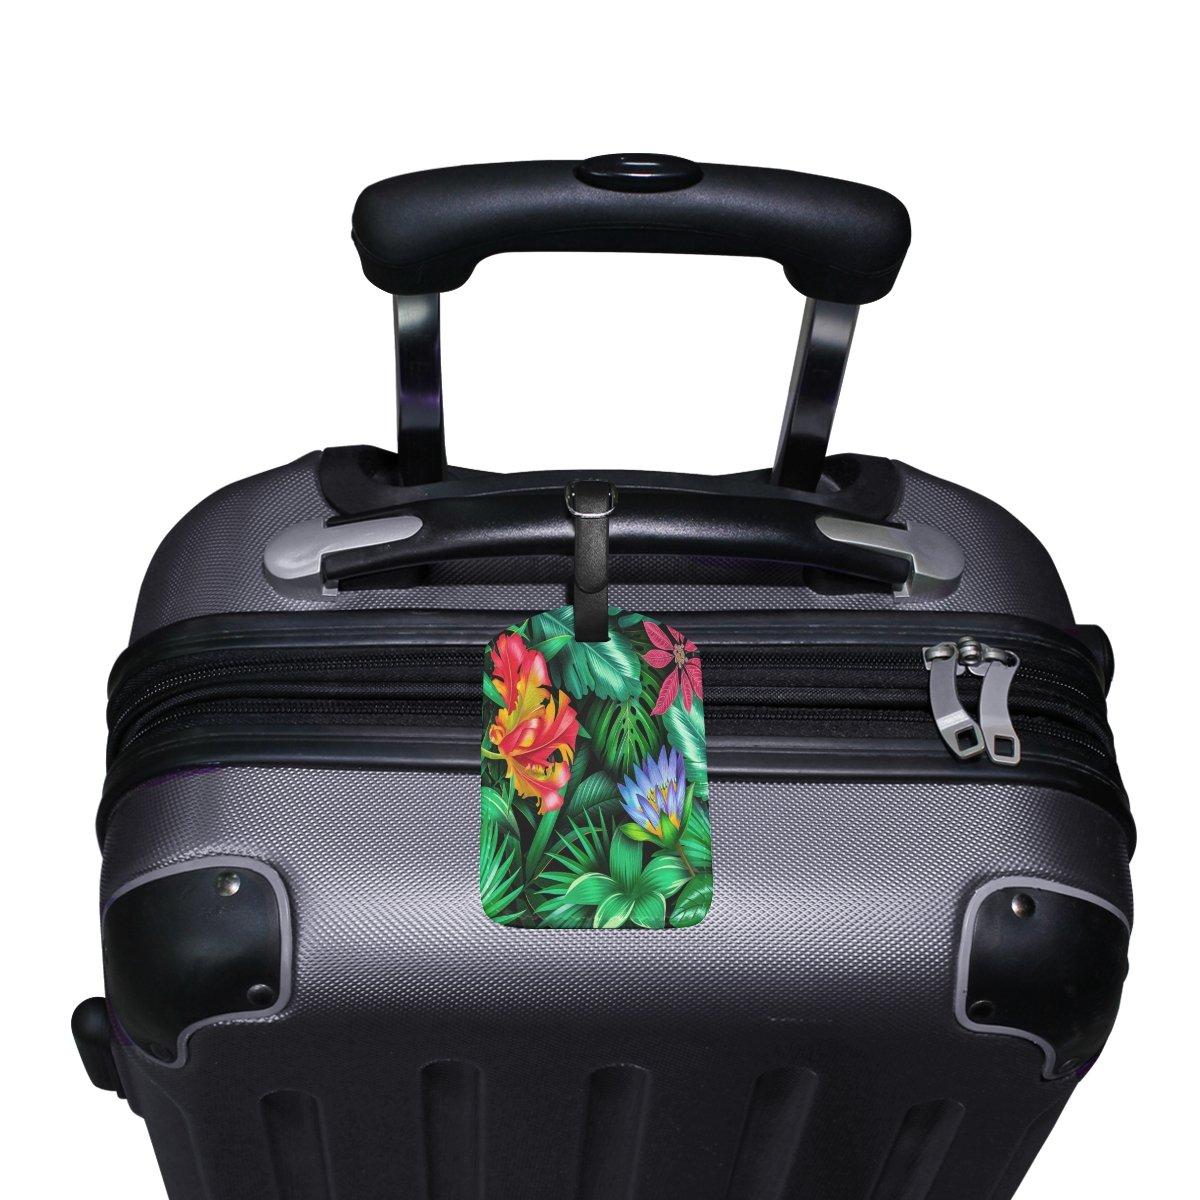 1Pcs Saobao Travel Luggage Tag Flowers Plant PU Leather Baggage Suitcase Travel ID Bag Tag